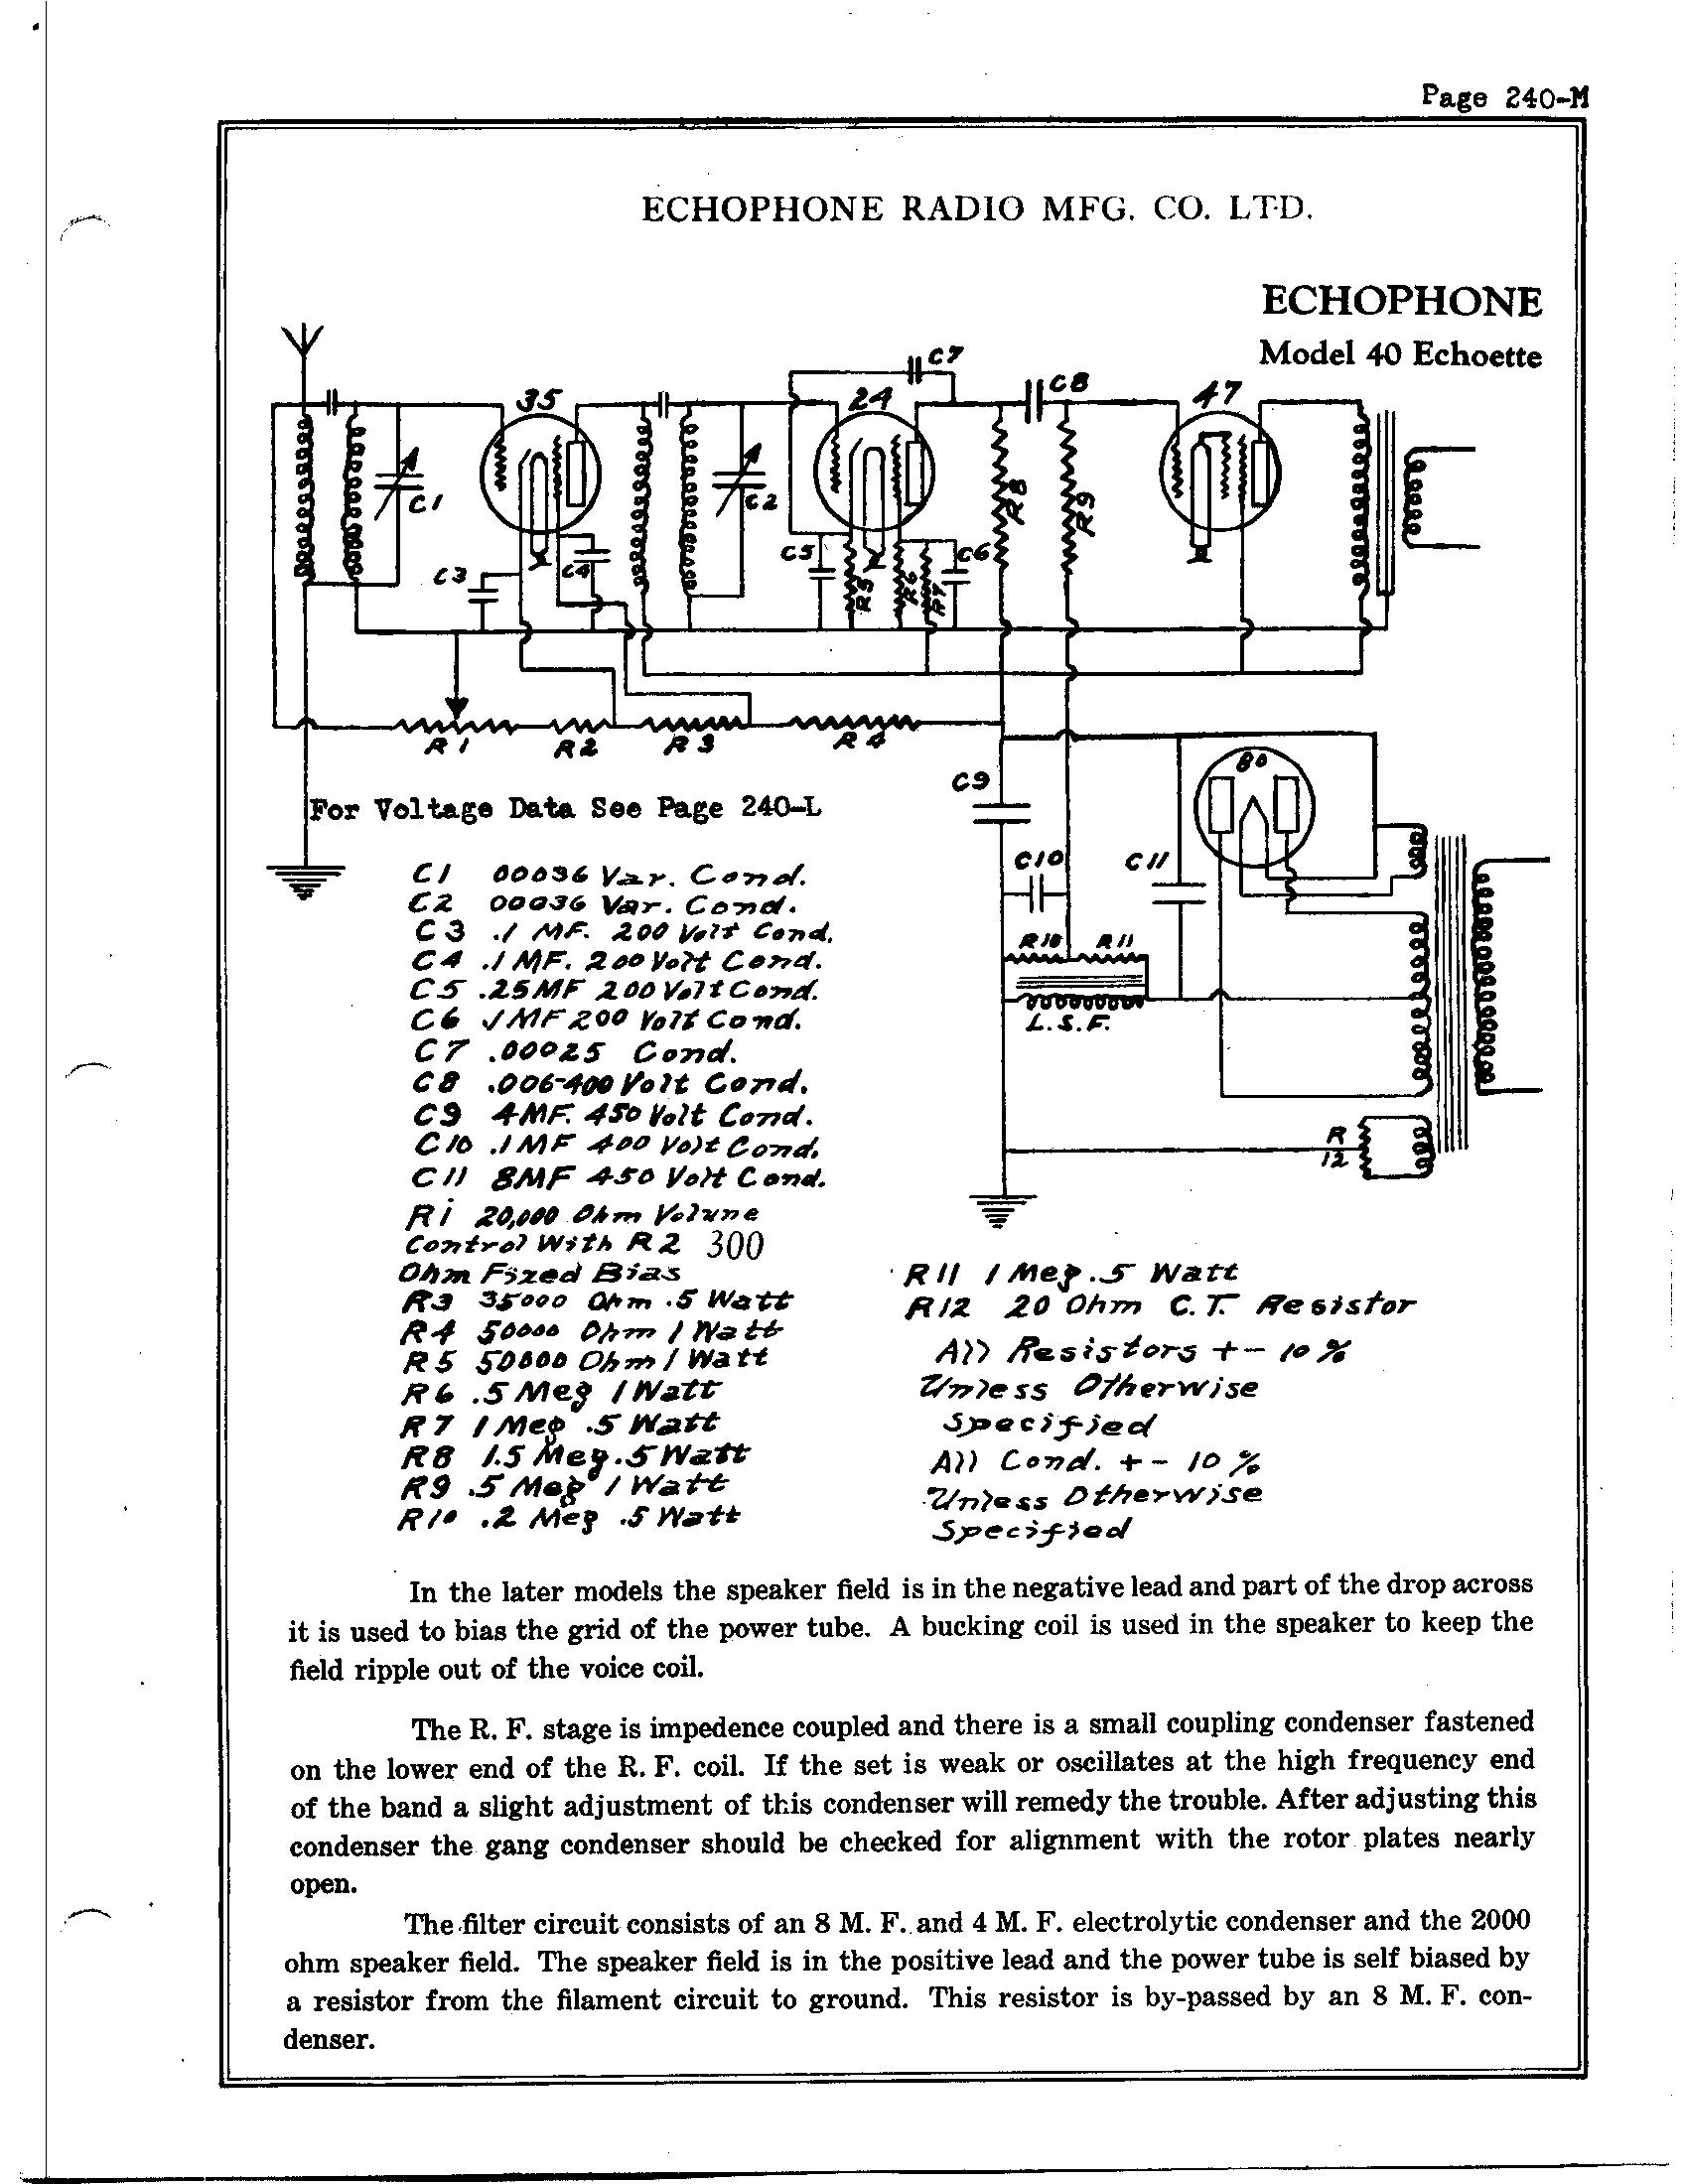 Echophone Radio Corp 40